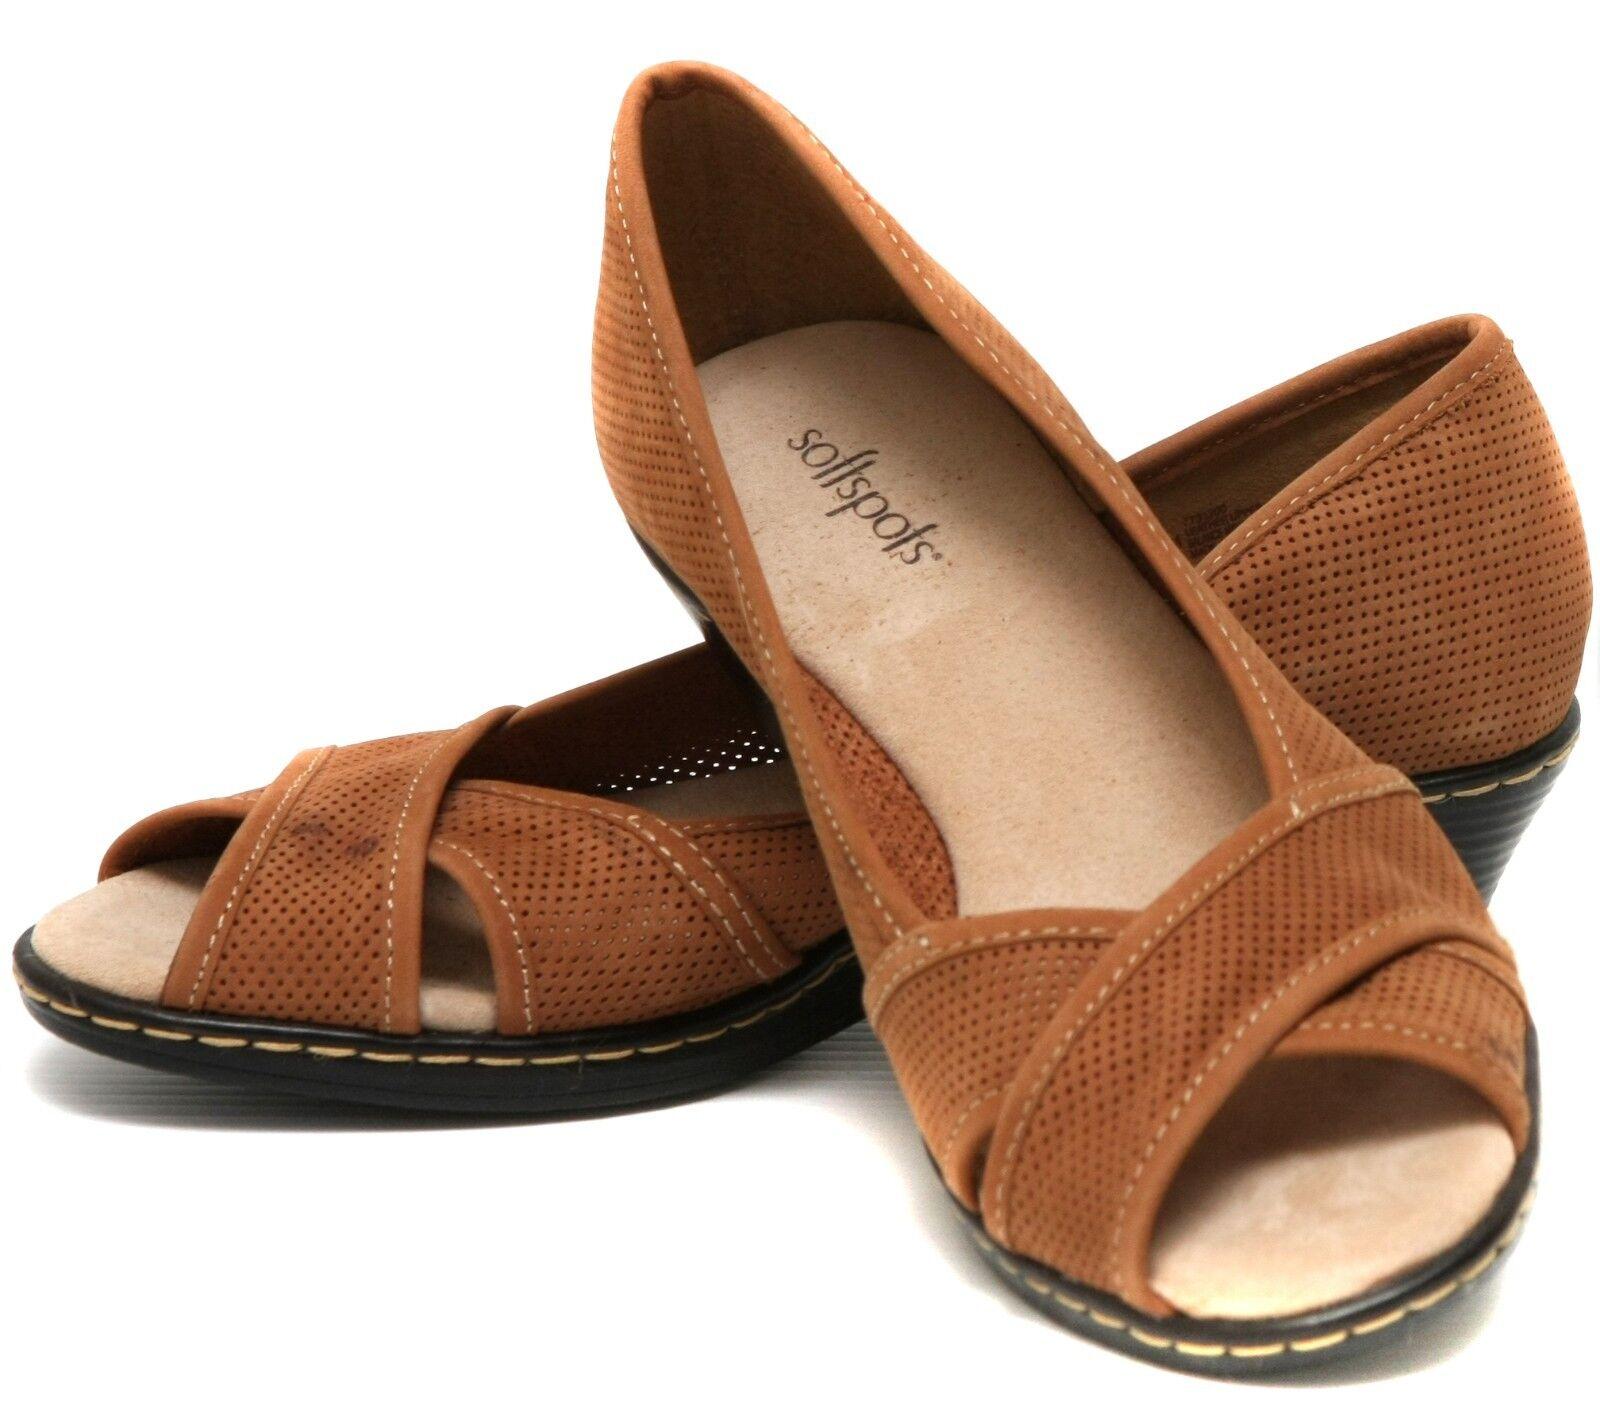 New Softspots Womens Wedge Heels 7731200 Eerin  Nubuck shoes  sz 6